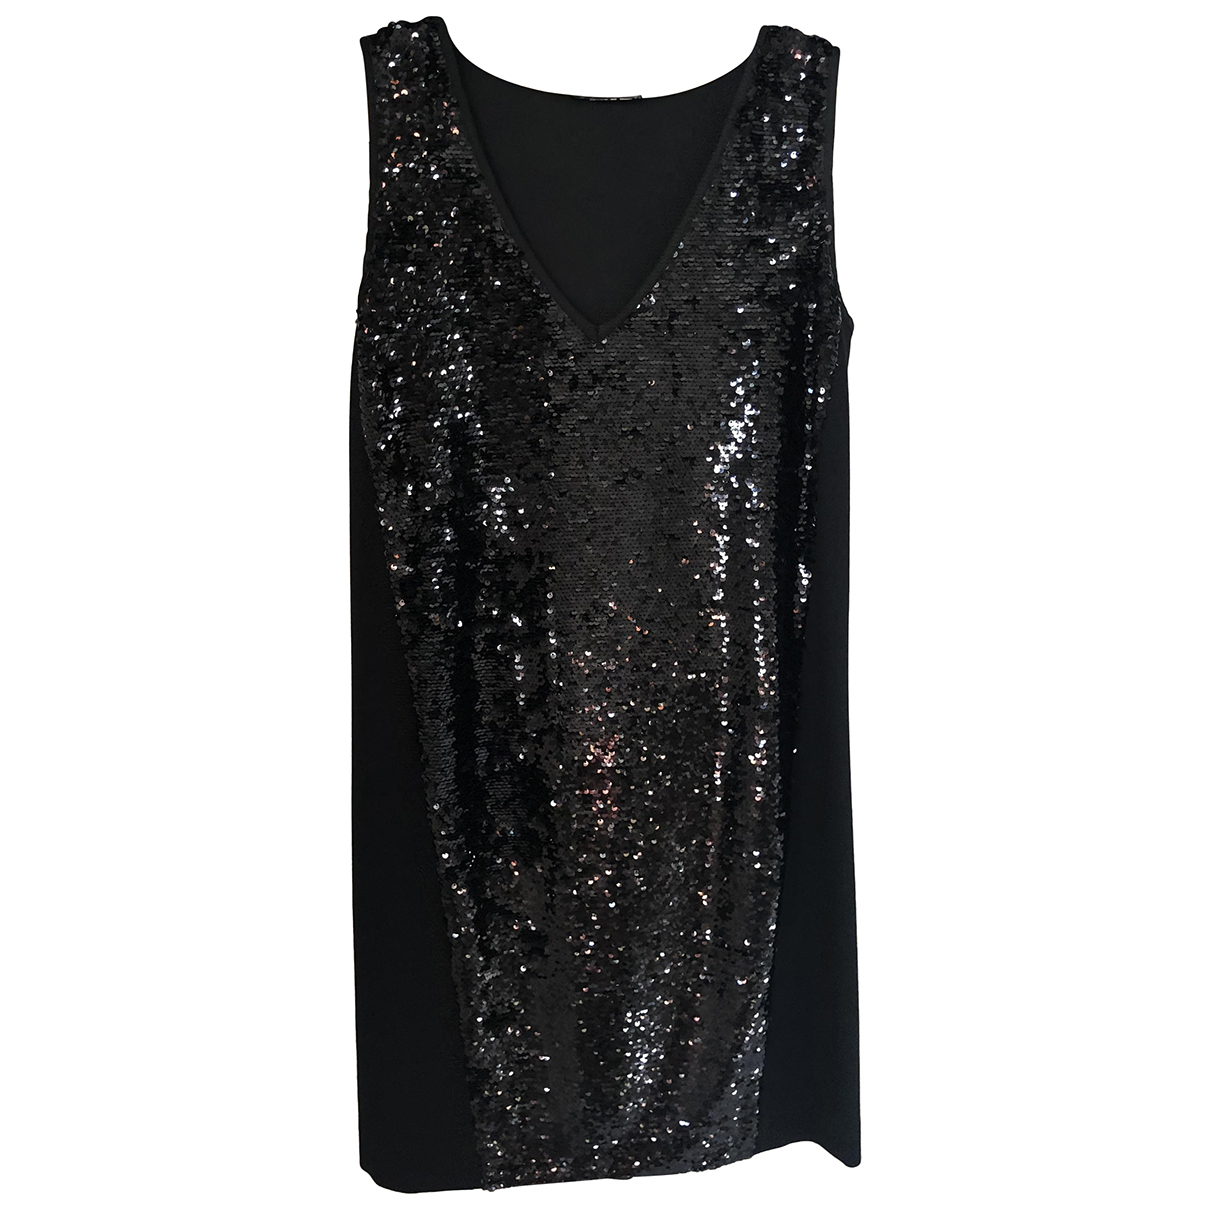 Liu.jo \N Kleid in  Schwarz Mit Pailletten